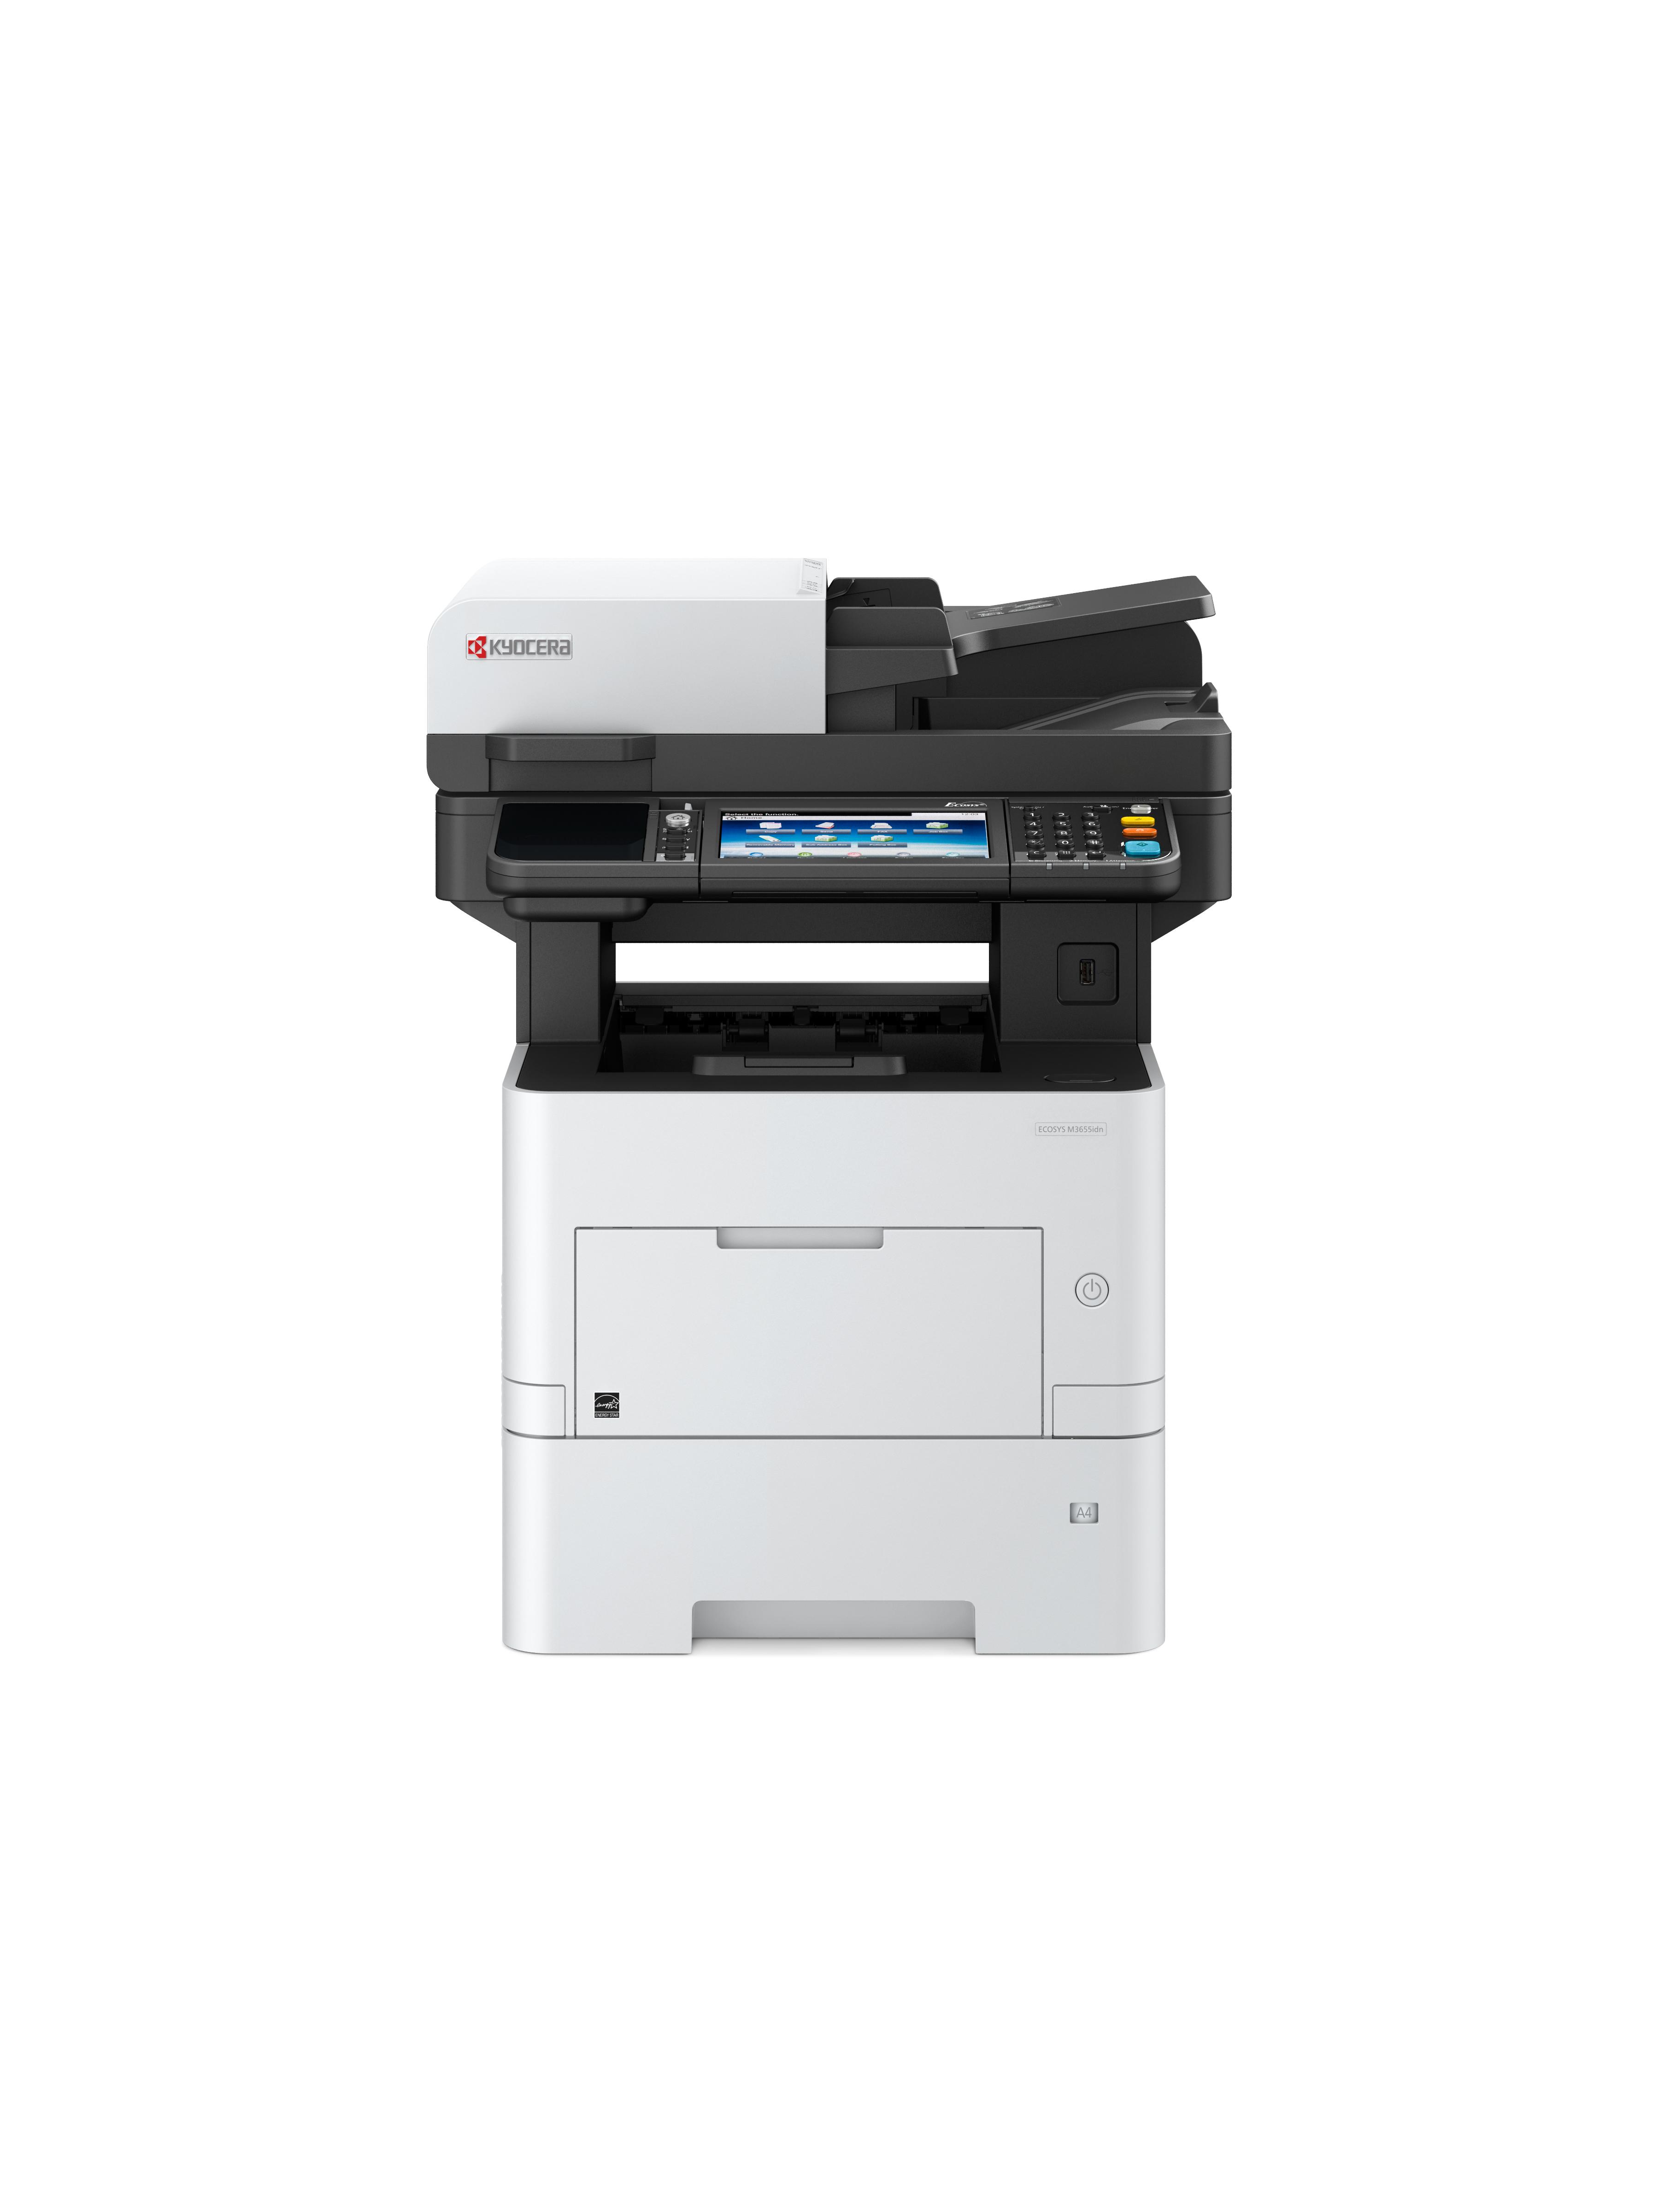 CLICK TO ENLARGE M3655idn copier